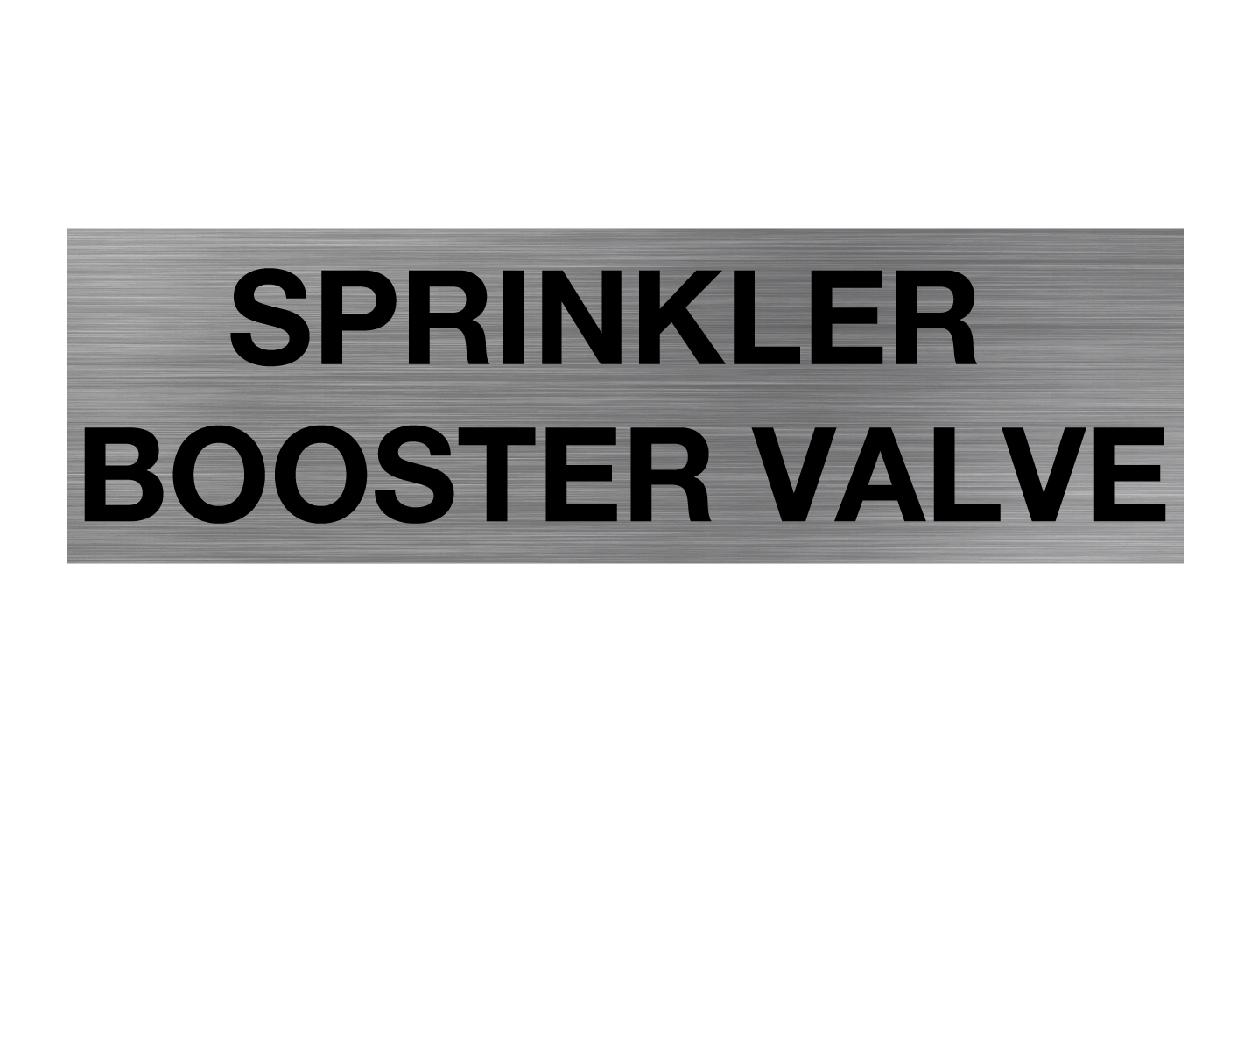 Sprinkler Booster Valve